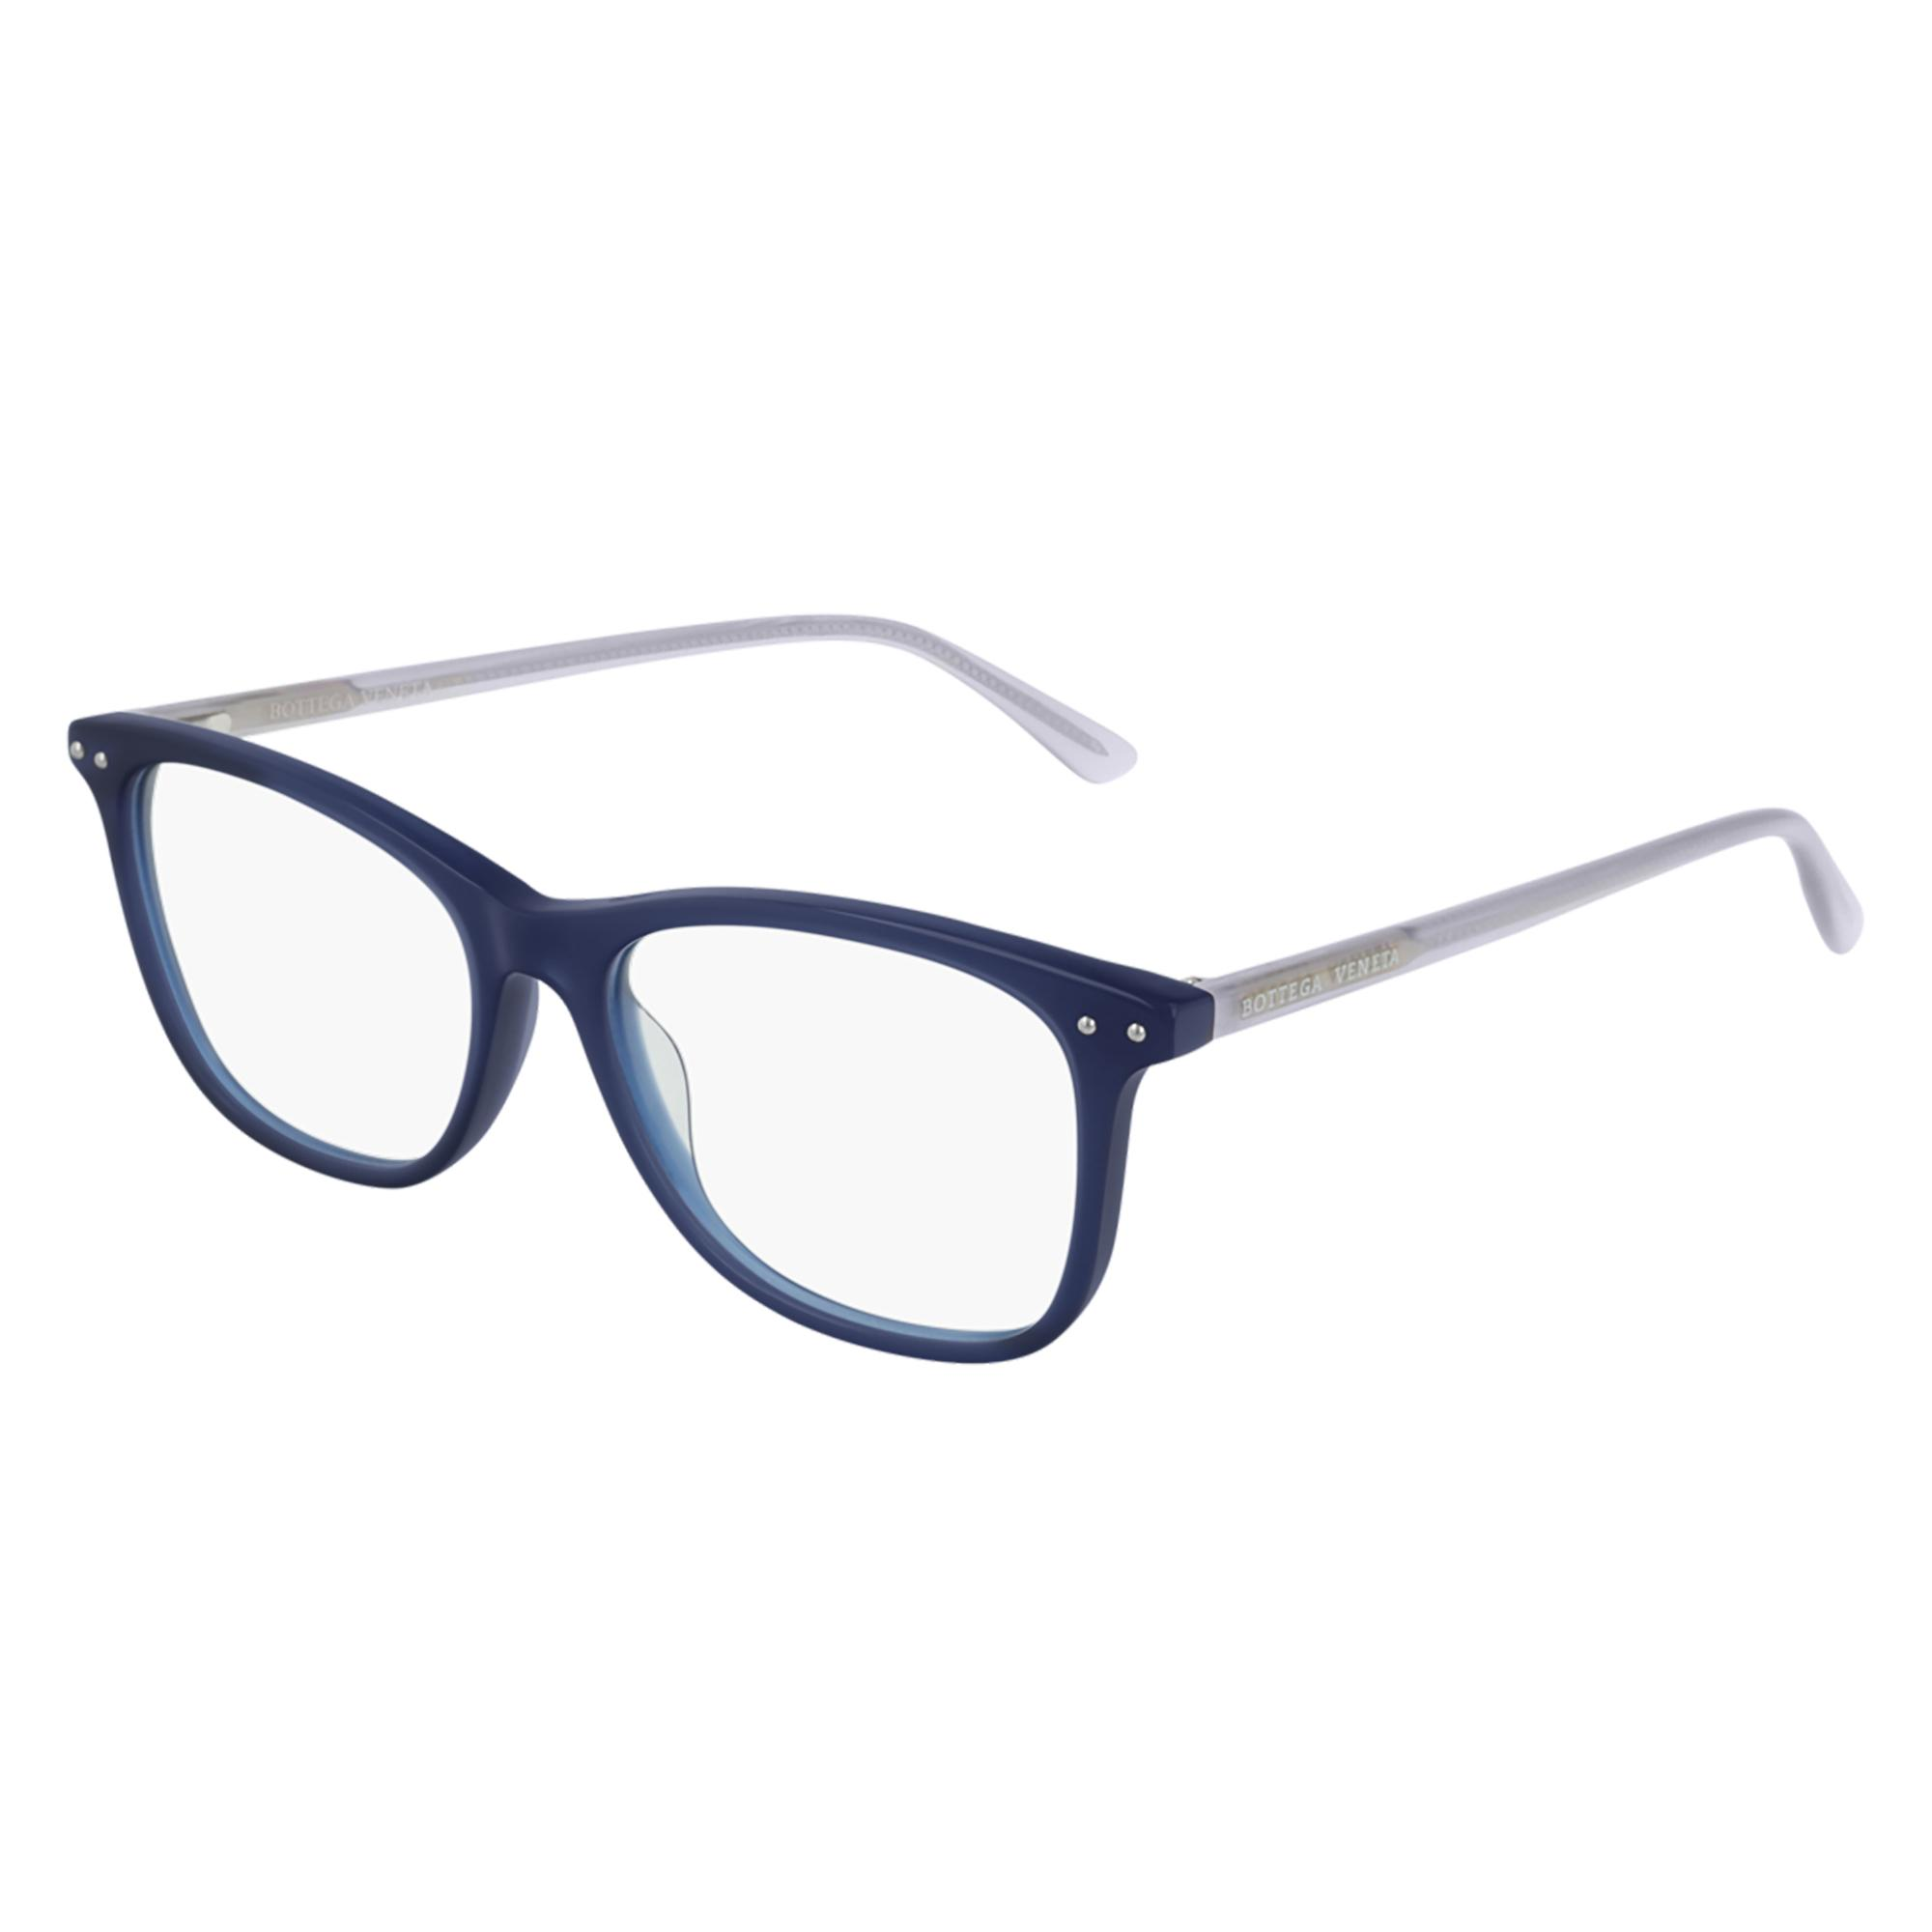 004 blue violet transpare